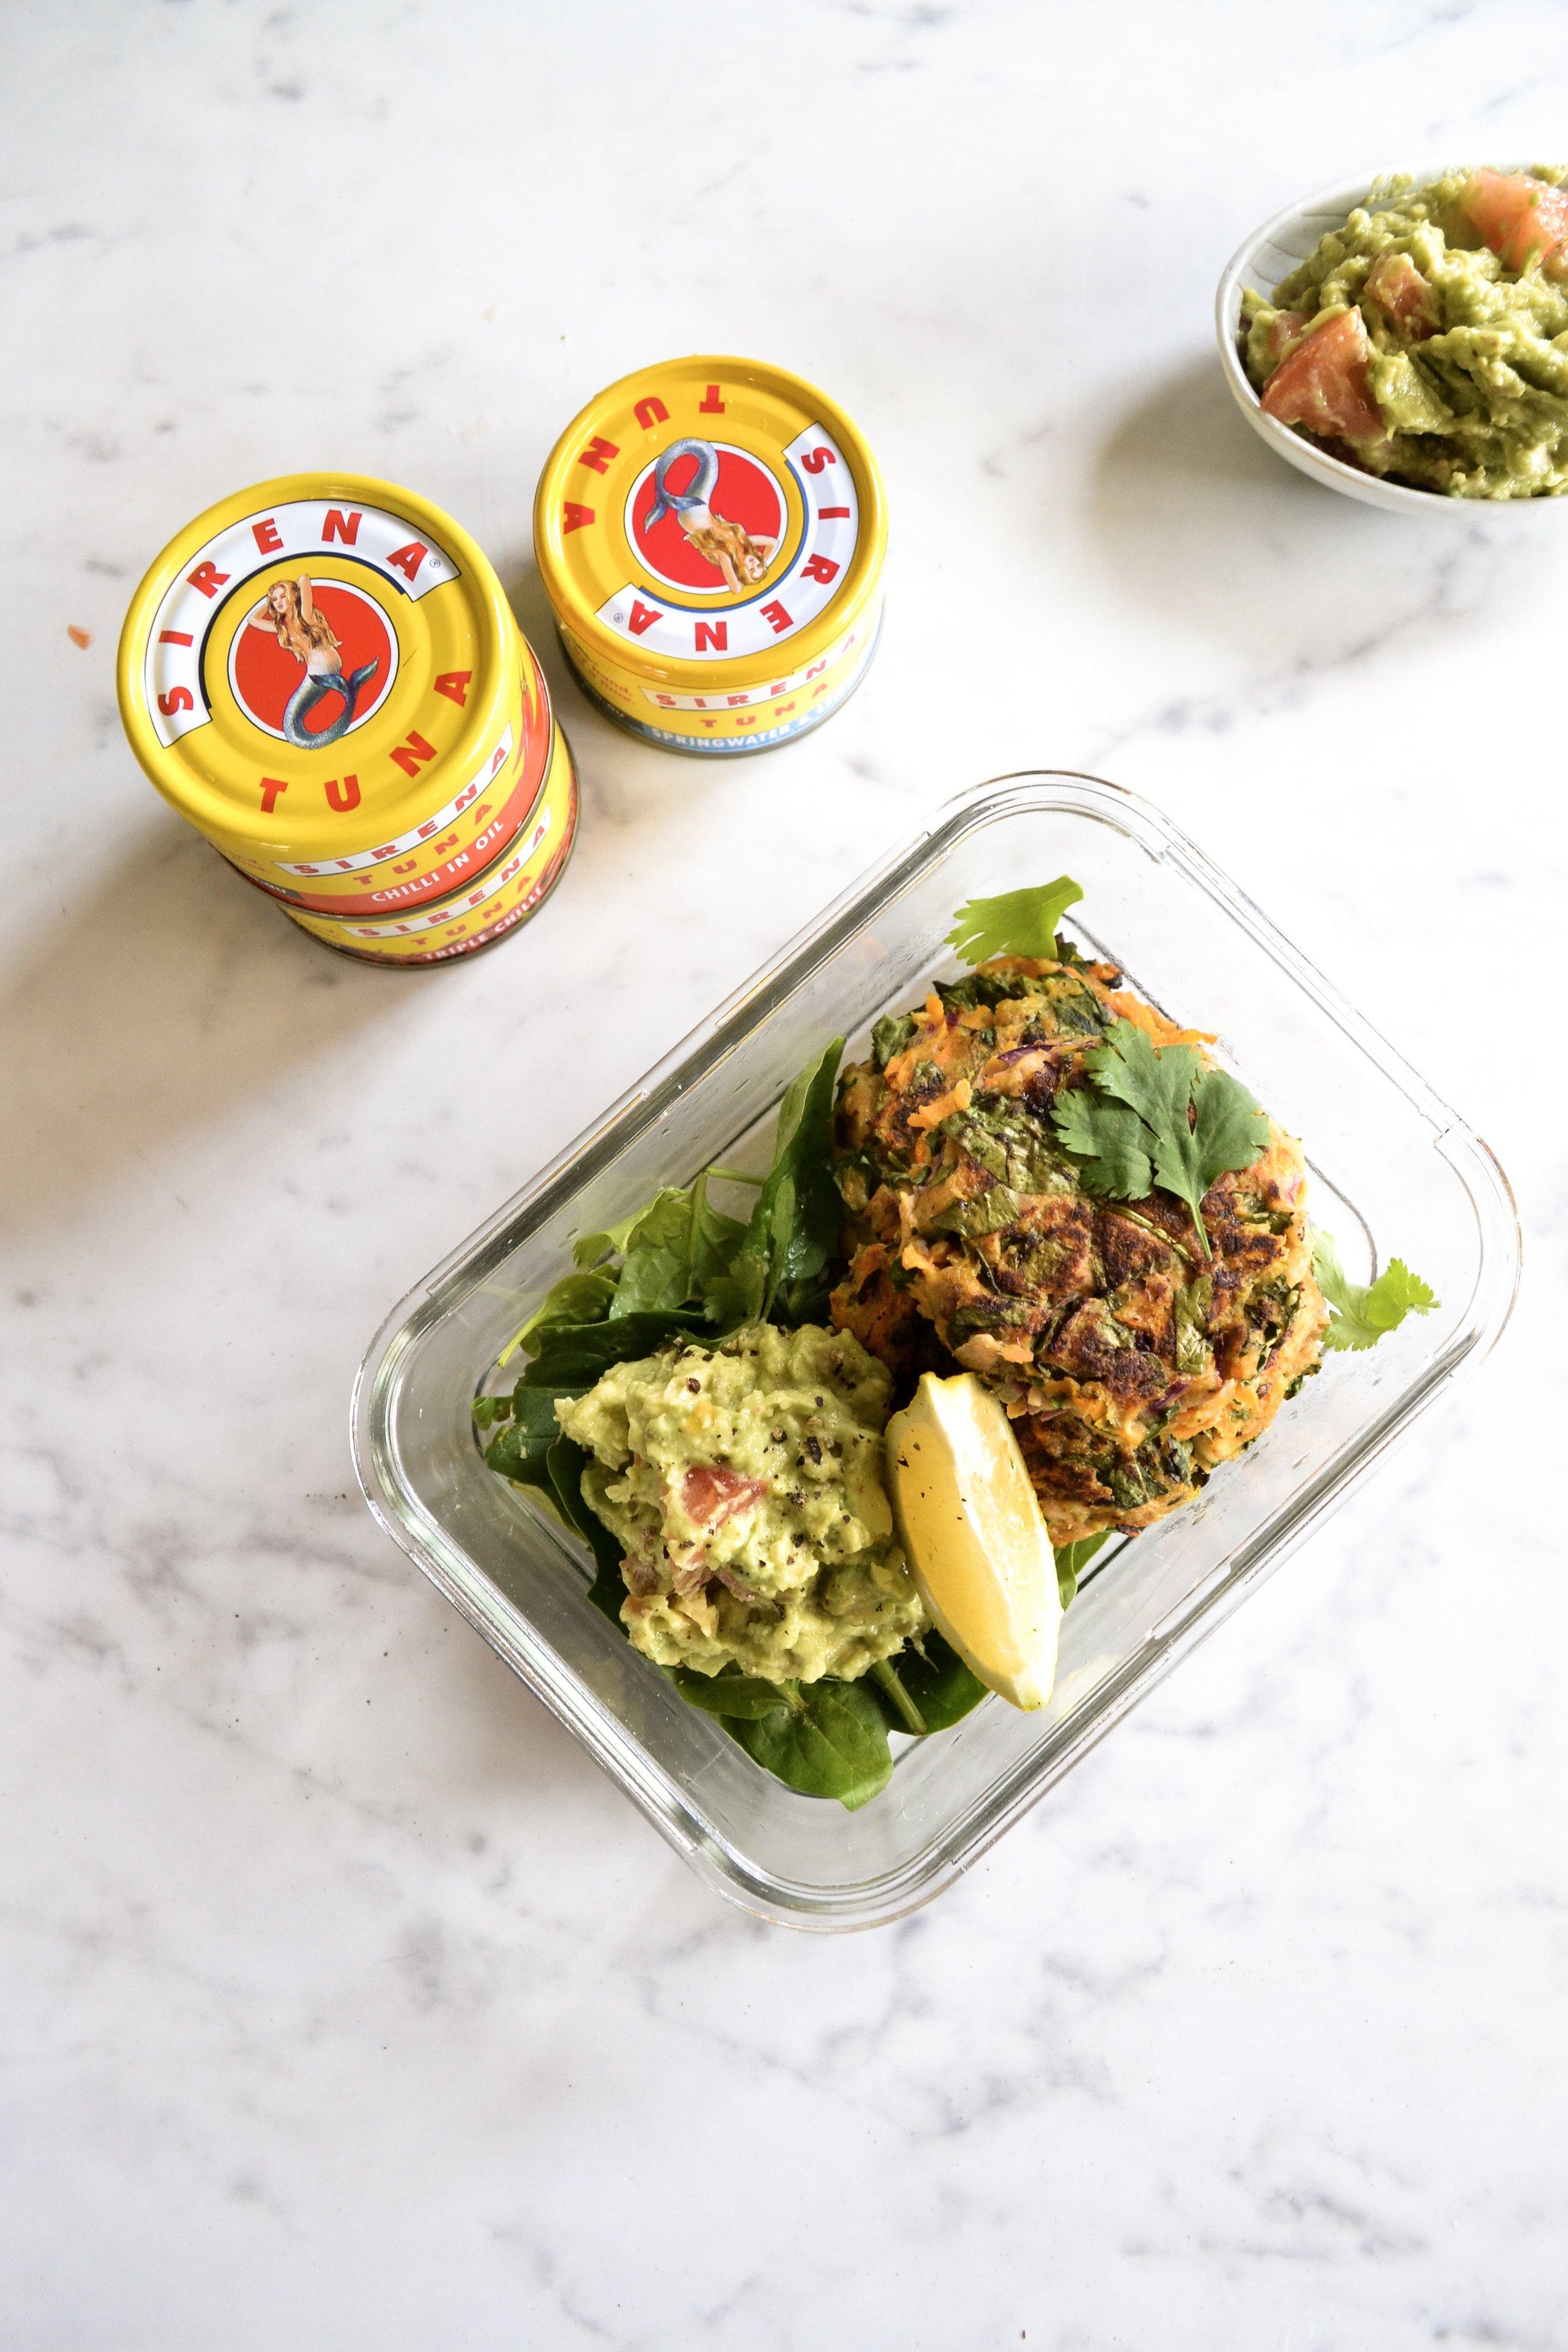 Sirena Chilli Lime Tuna Patties (gluten free)